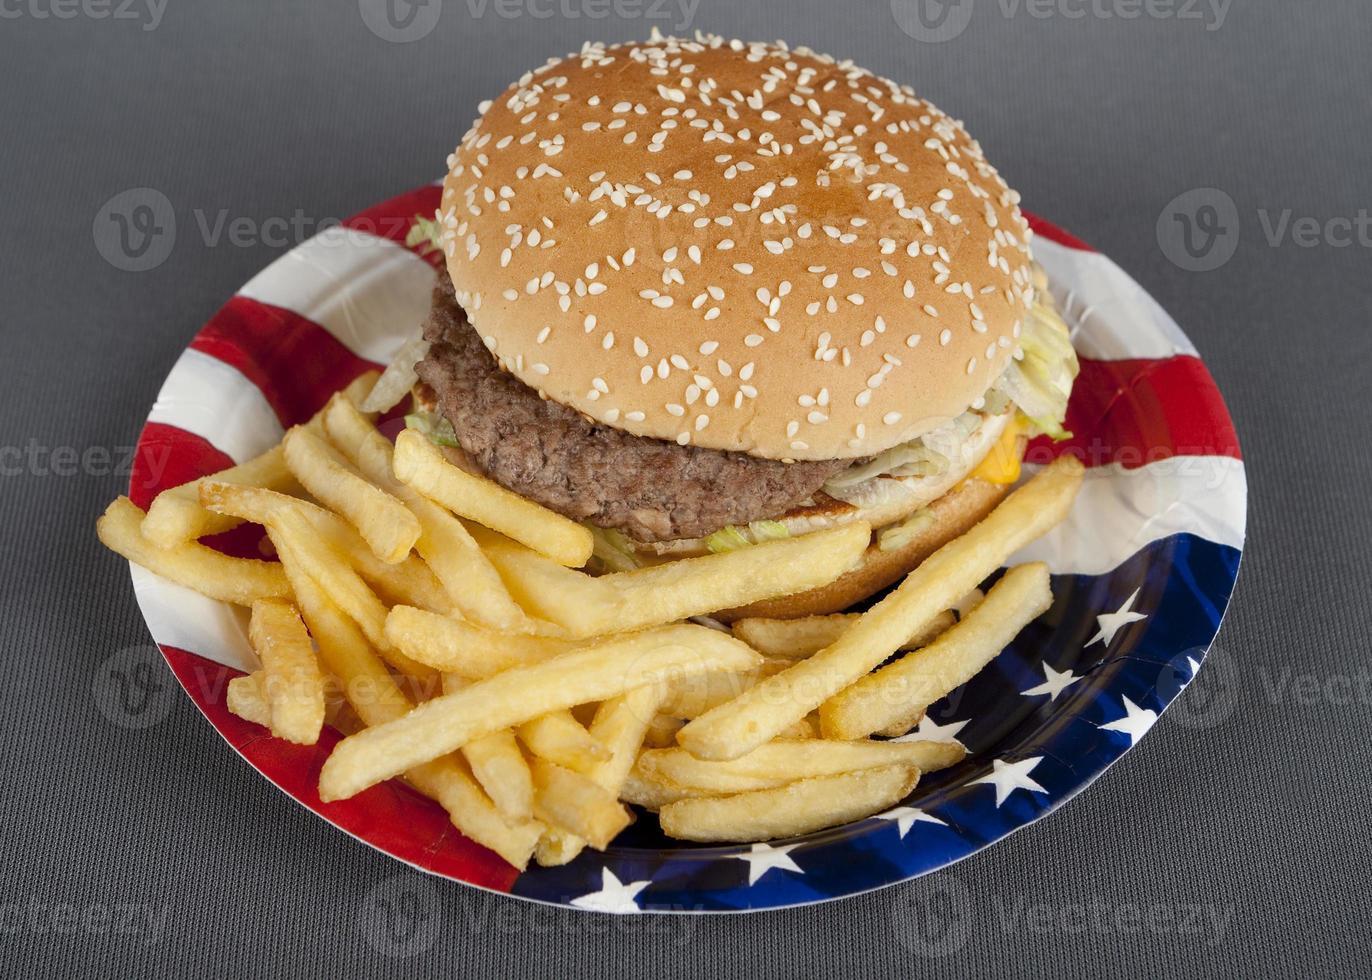 Hamburger auf Pappteller Amerika Stil foto